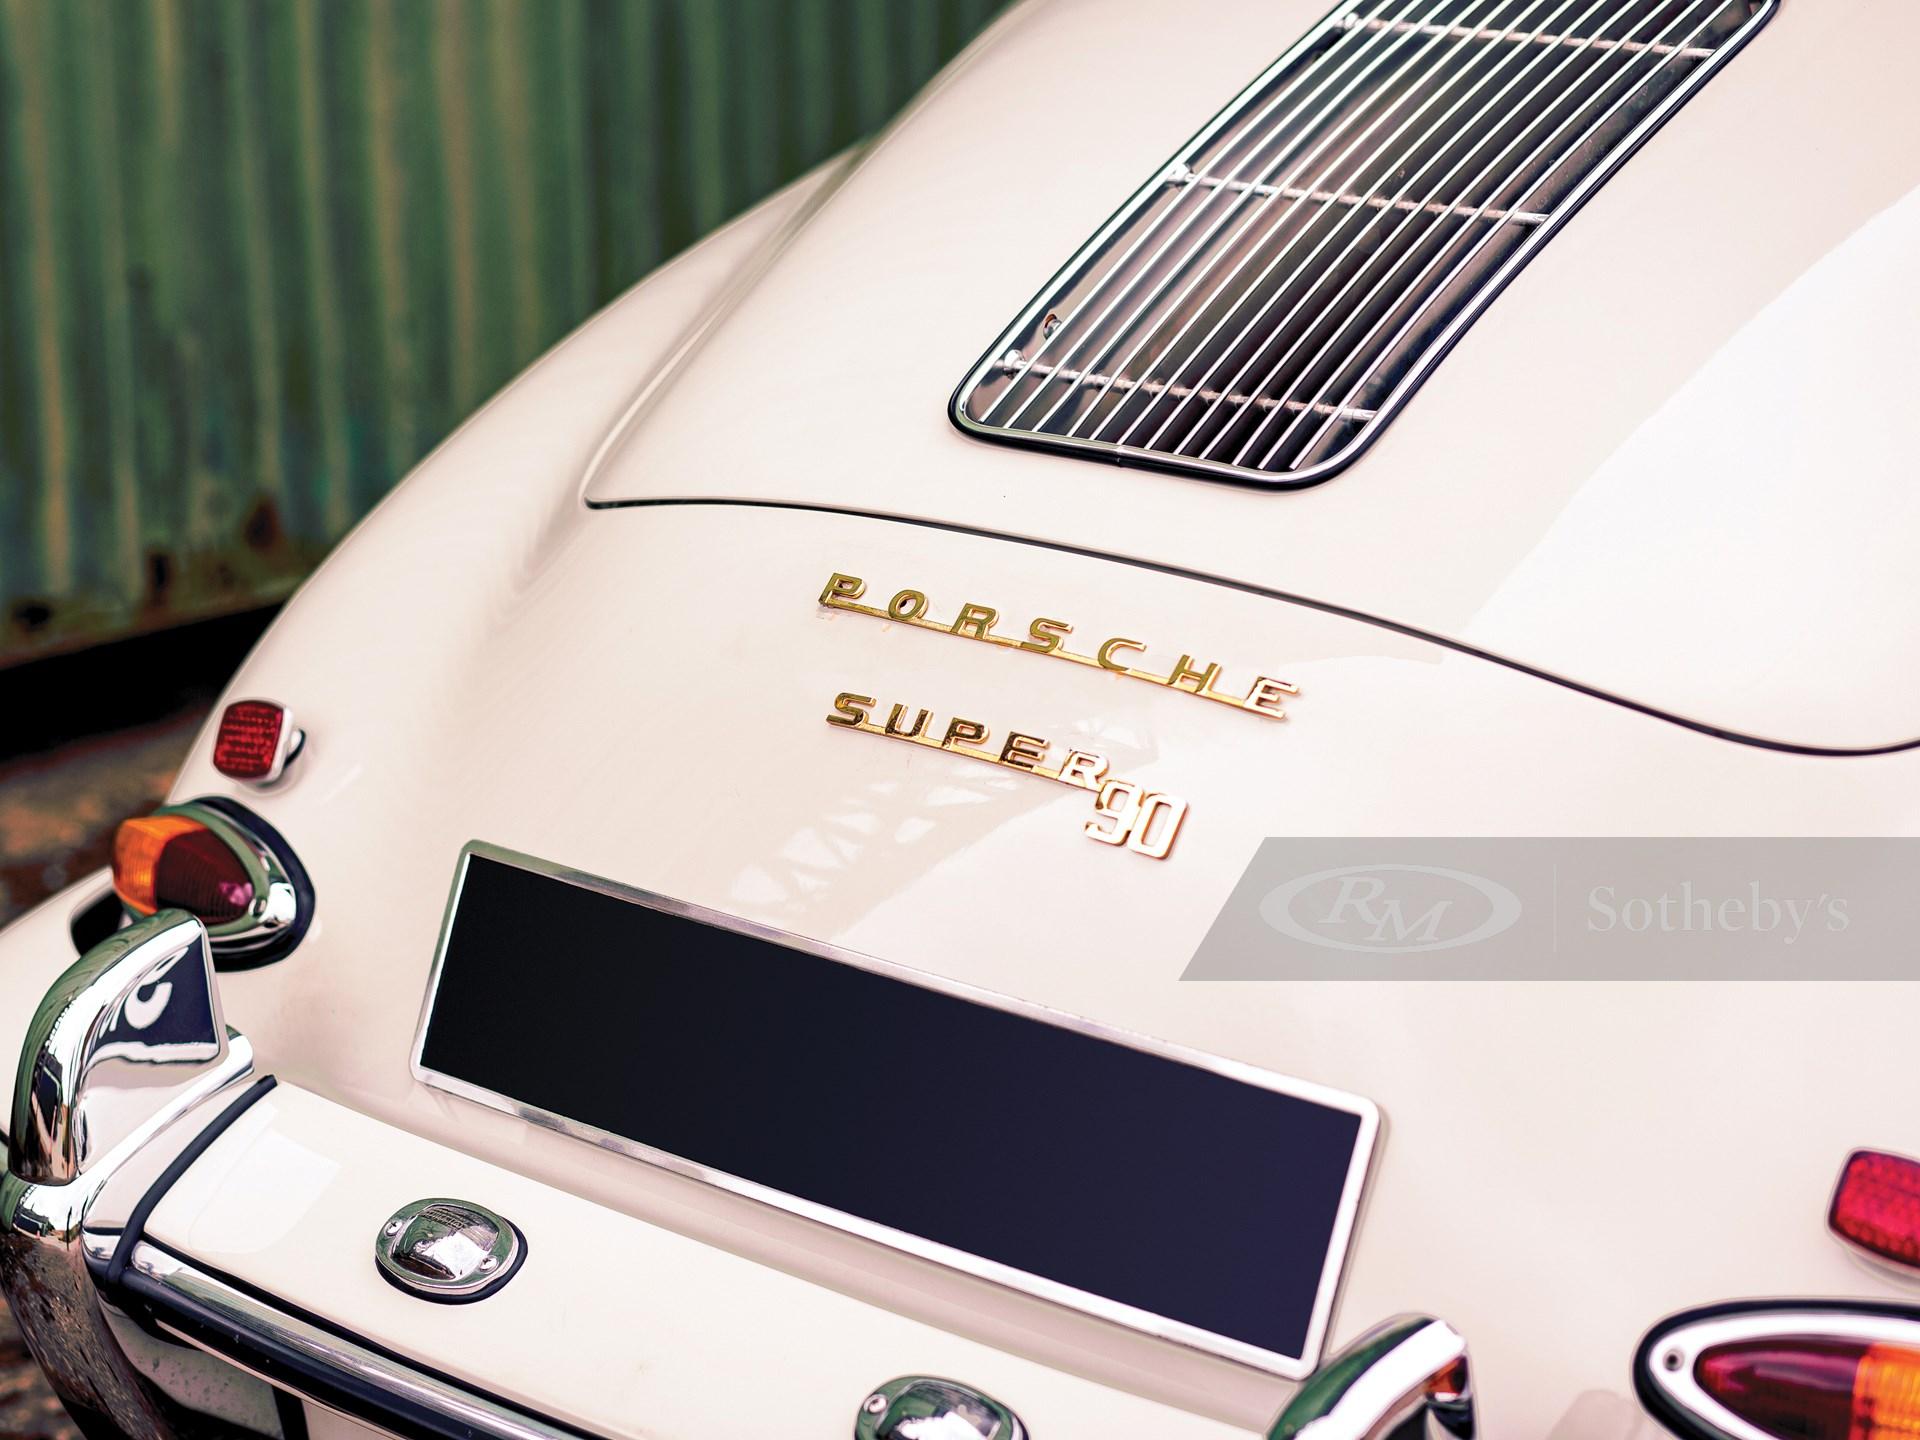 1961 Porsche 356 B Super 90 Cabriolet by Reutter -